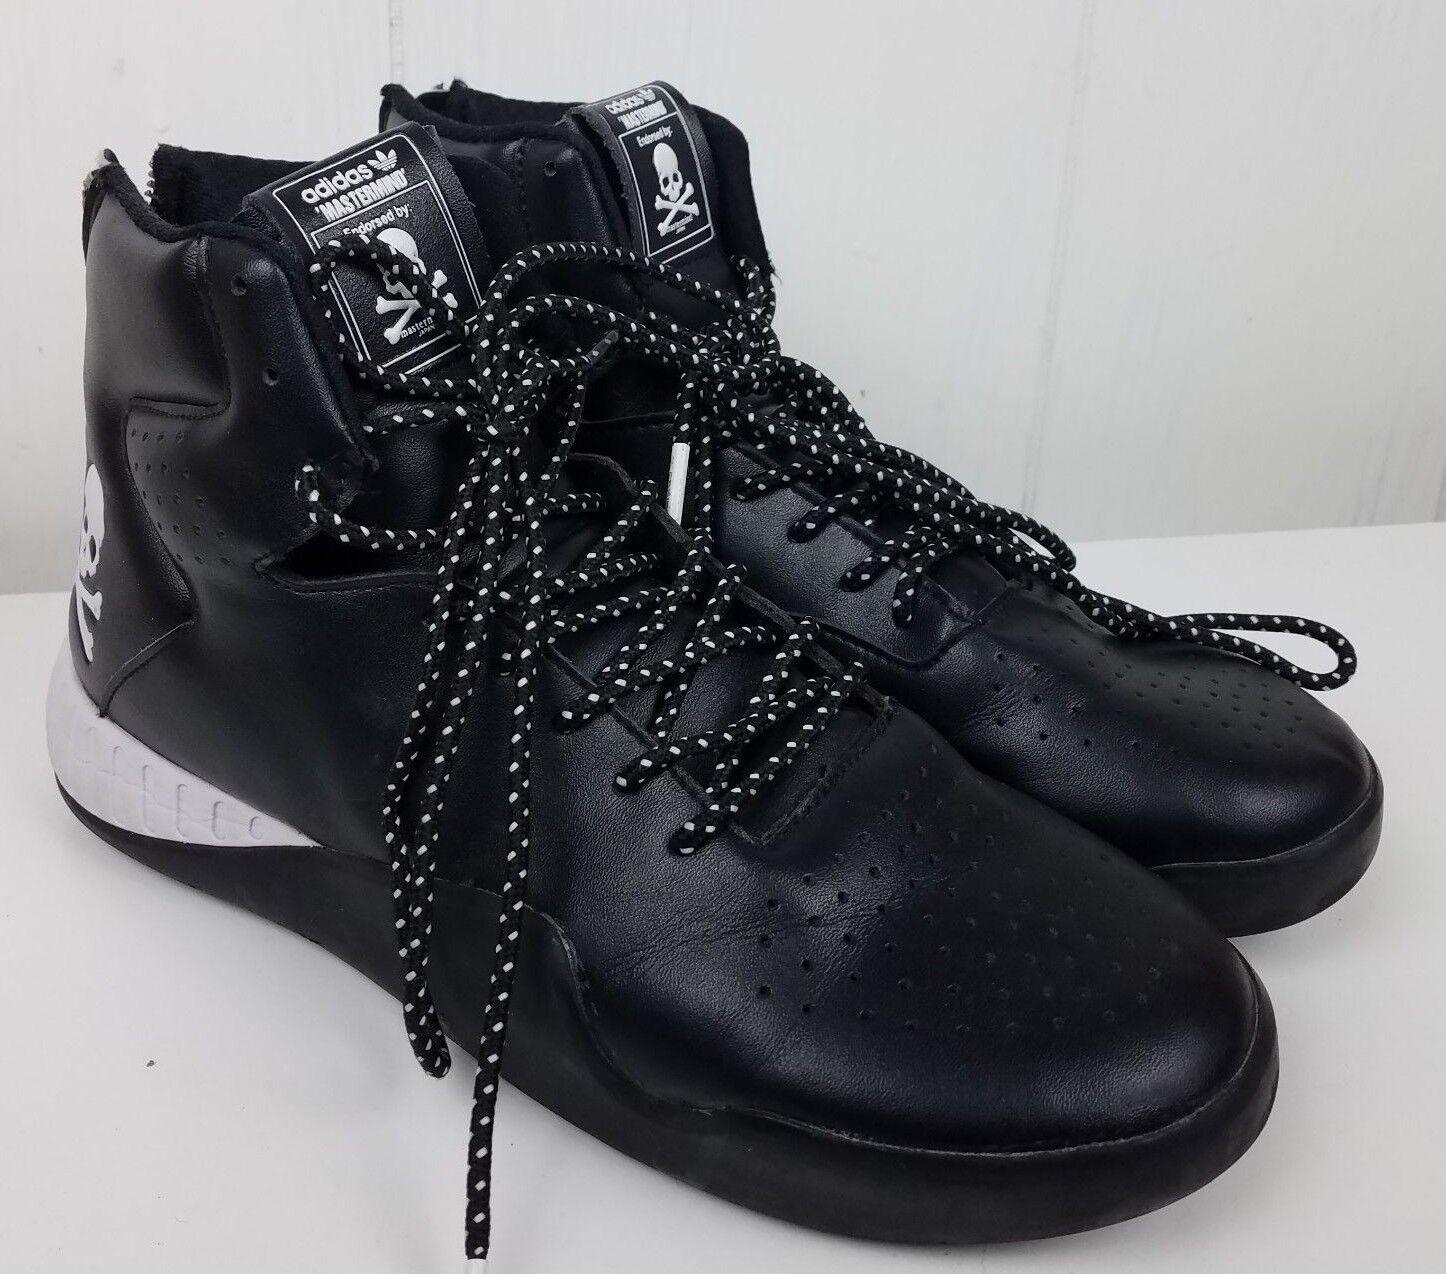 TUBULAR INSTINCT MMJ MASTERMIND size 8 Men's Black white shoes Sneakers